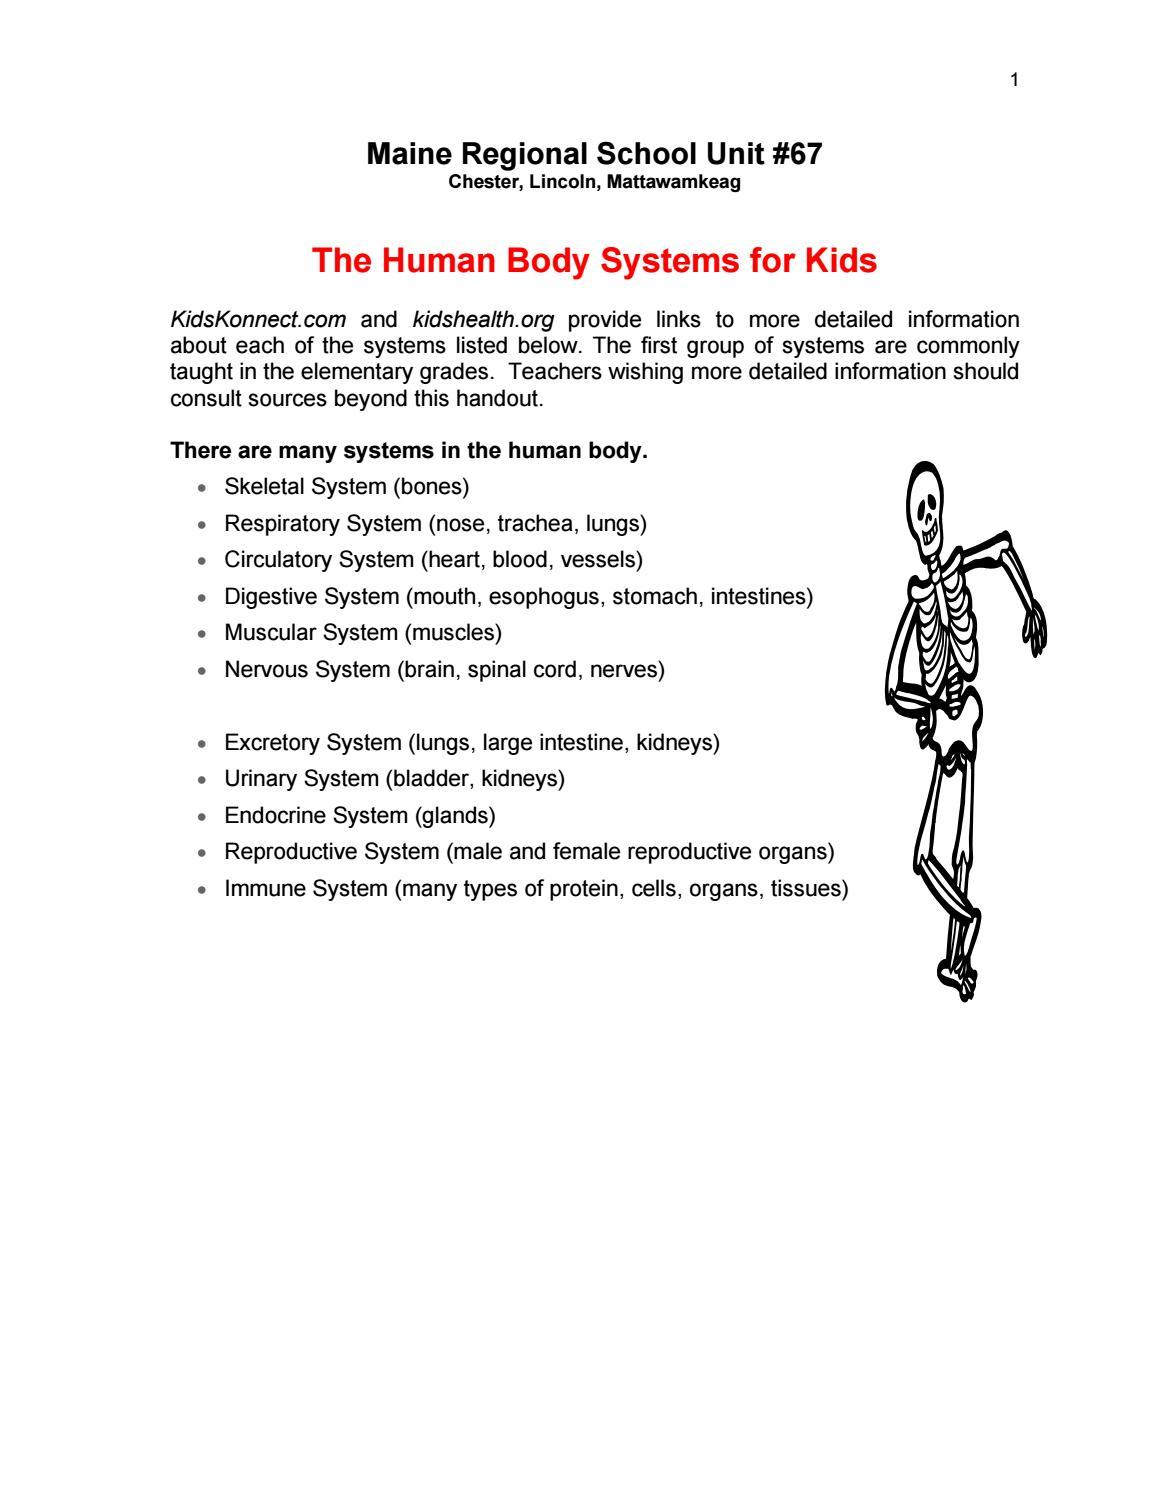 The Human Body Systems By Mjose Darder Navarro Issuu